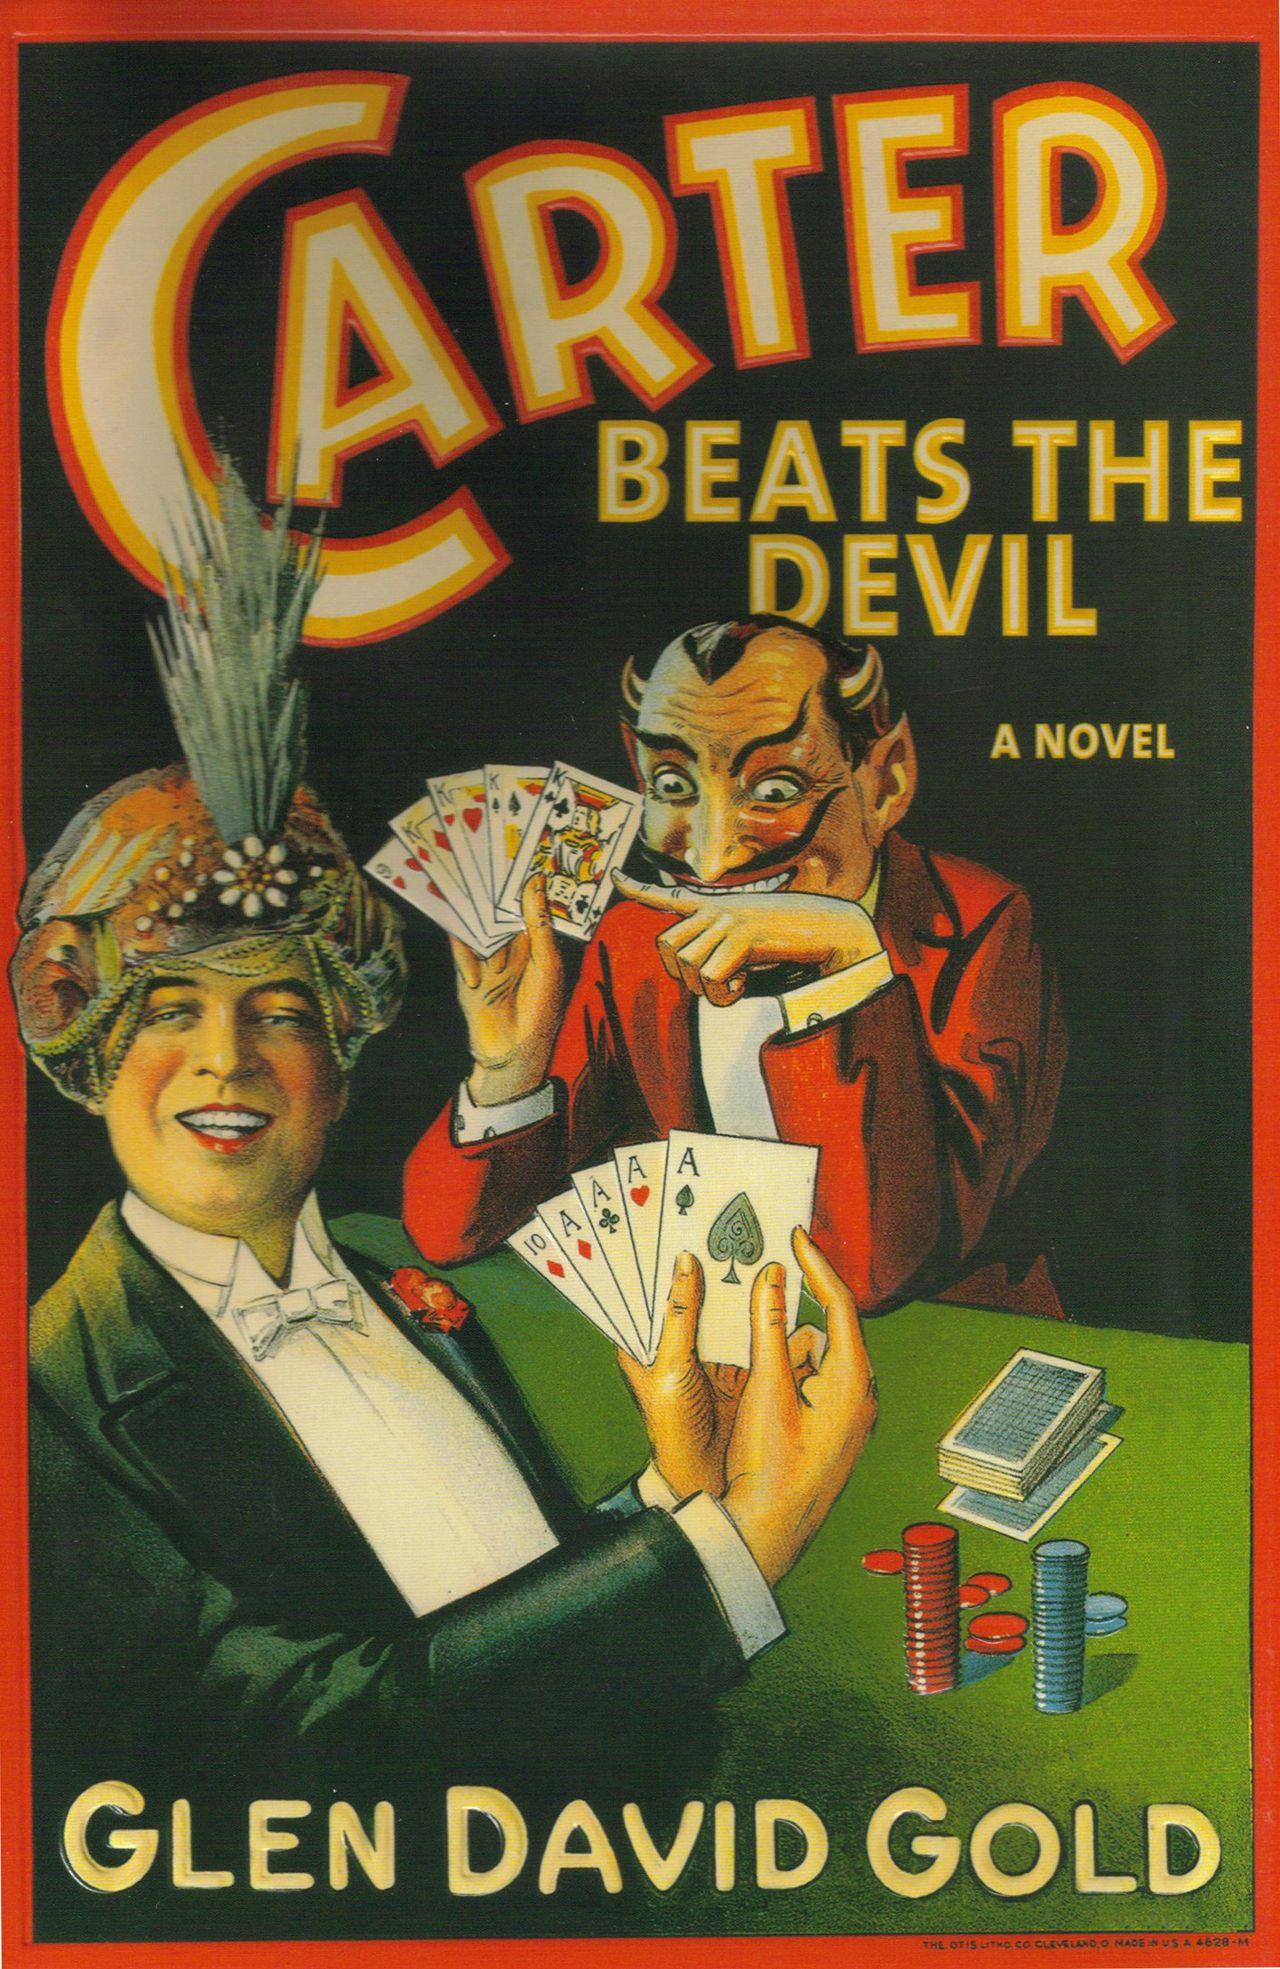 Carter Beats the Devil Cocktail Recipe | The Savory - Mezcal